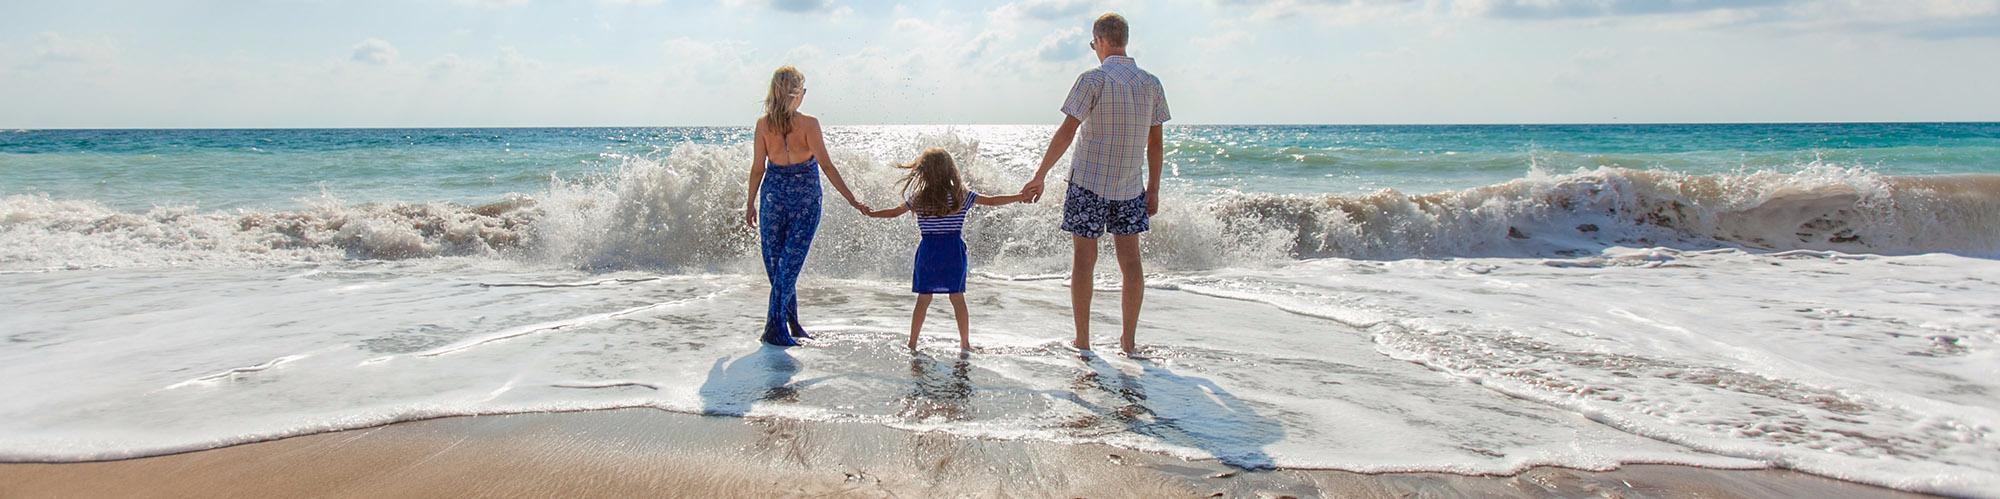 Sri Lanka: Toll für Familienurlaub